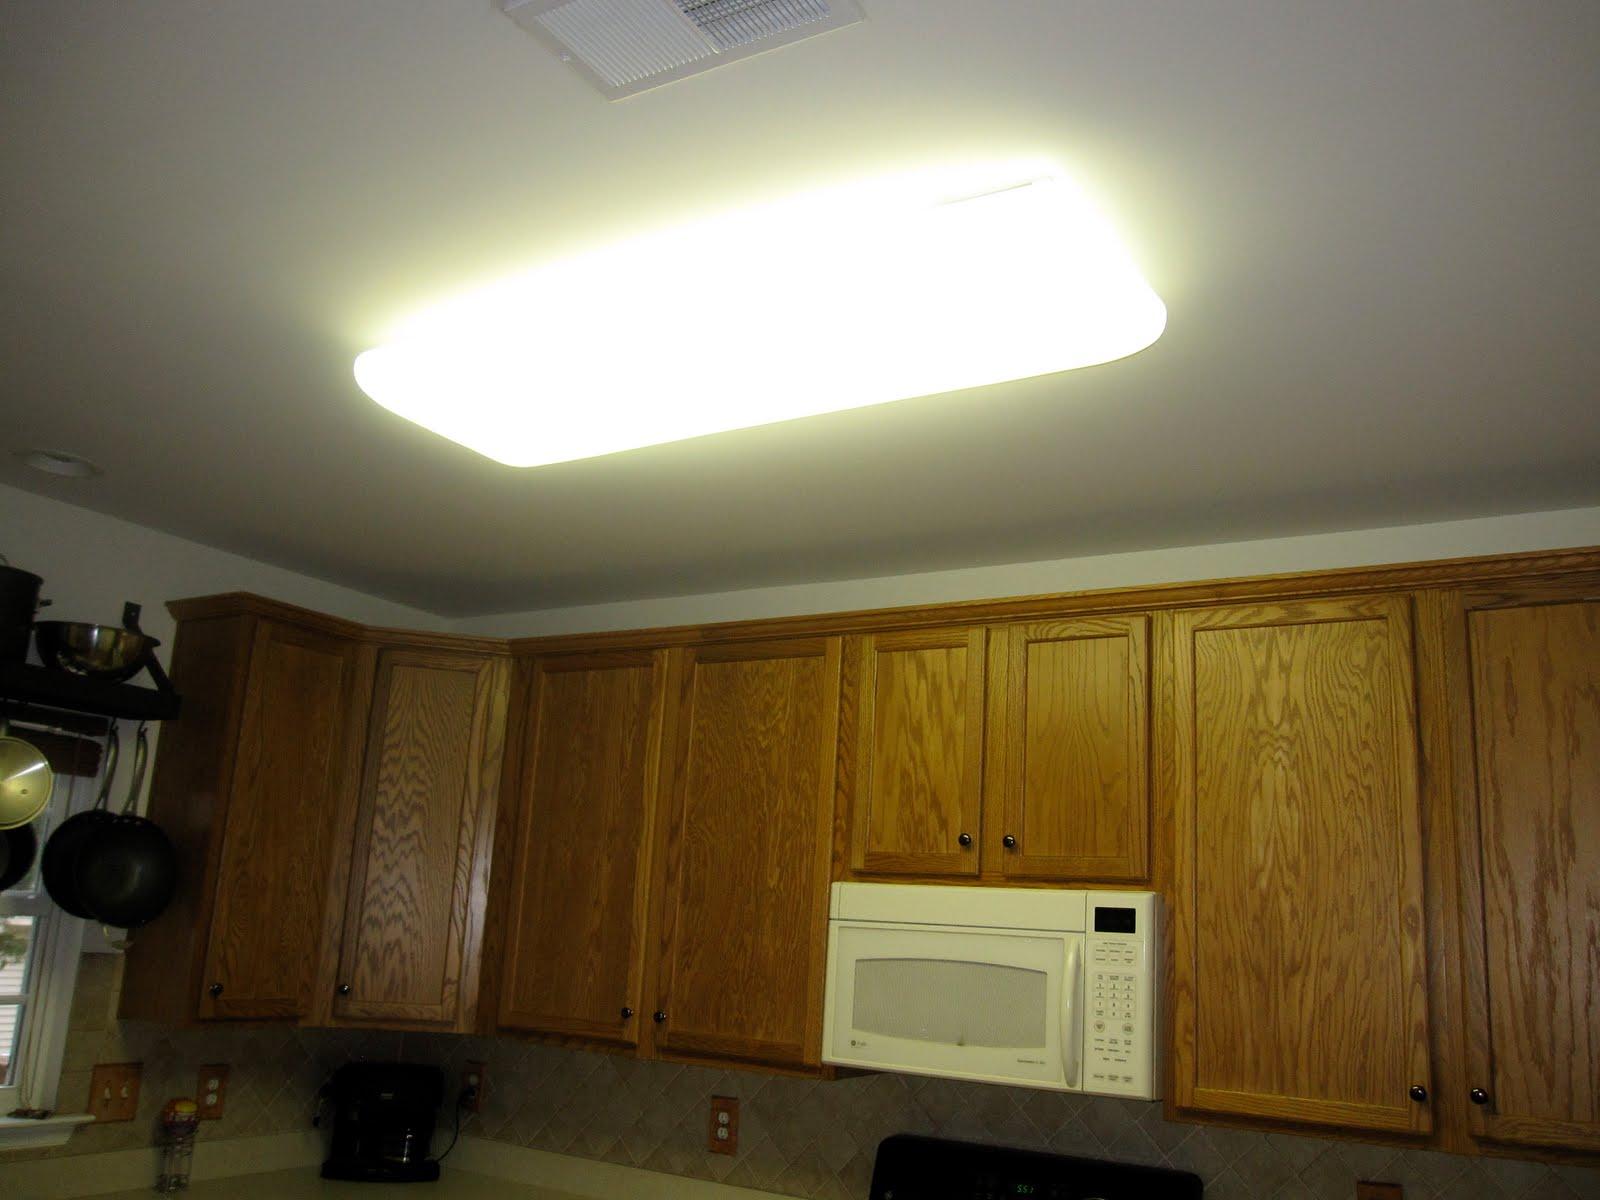 Fluorescent Lights For Kitchens Glamorous lighting using fluorescent ceiling lights warisan lighting glamorous lighting using fluorescent ceiling lights workwithnaturefo